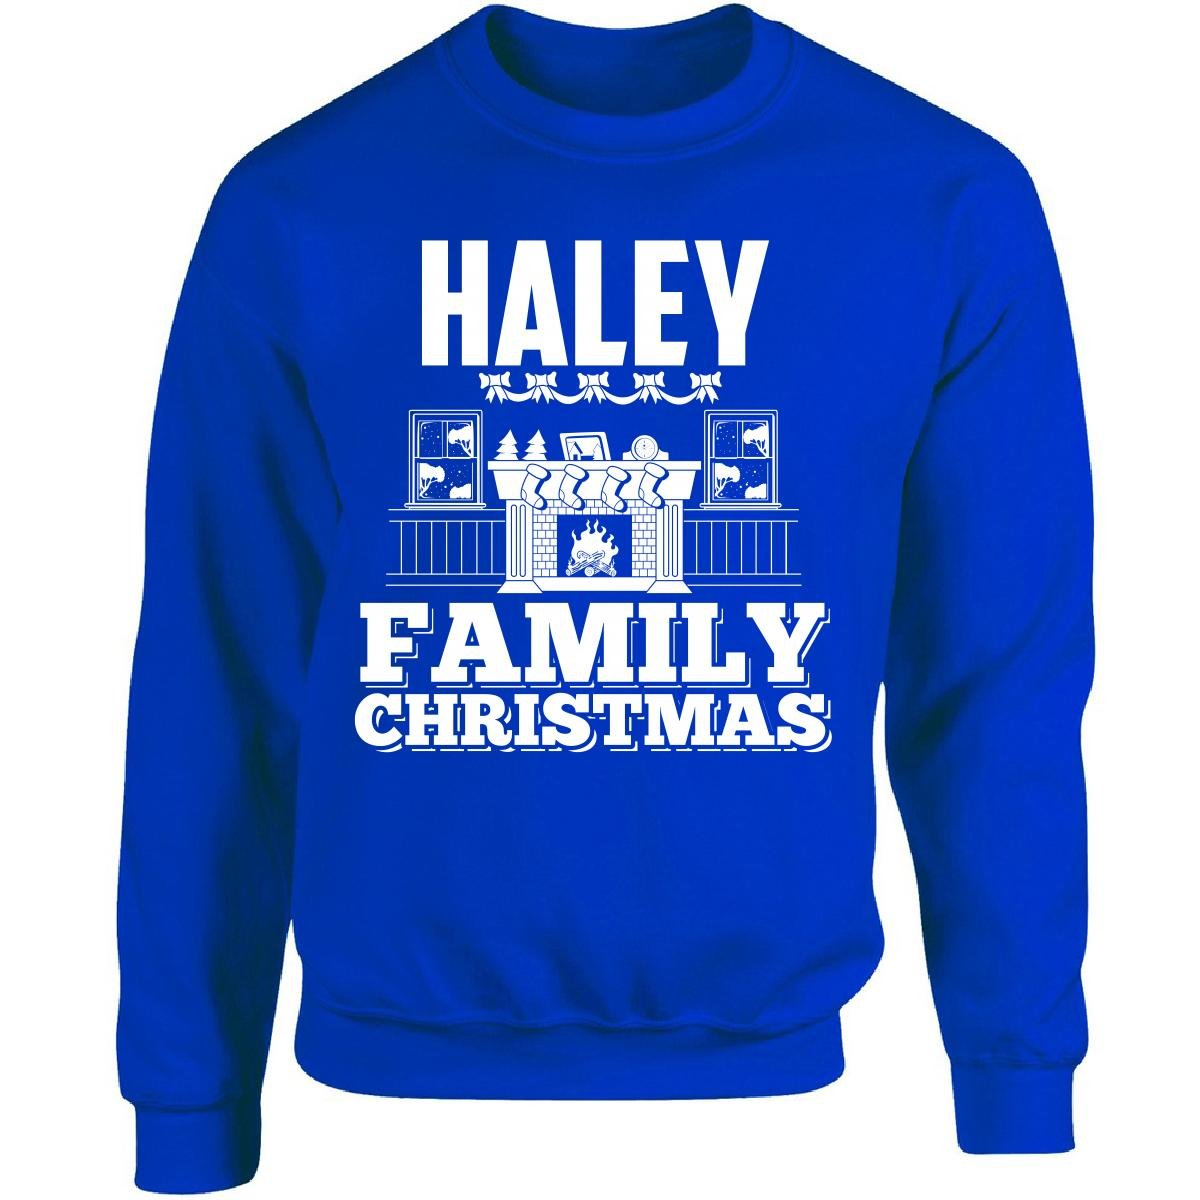 2c90c7c3 Haley Family Christmas - Adult Sweatshirt at Amazon Men's Clothing store: